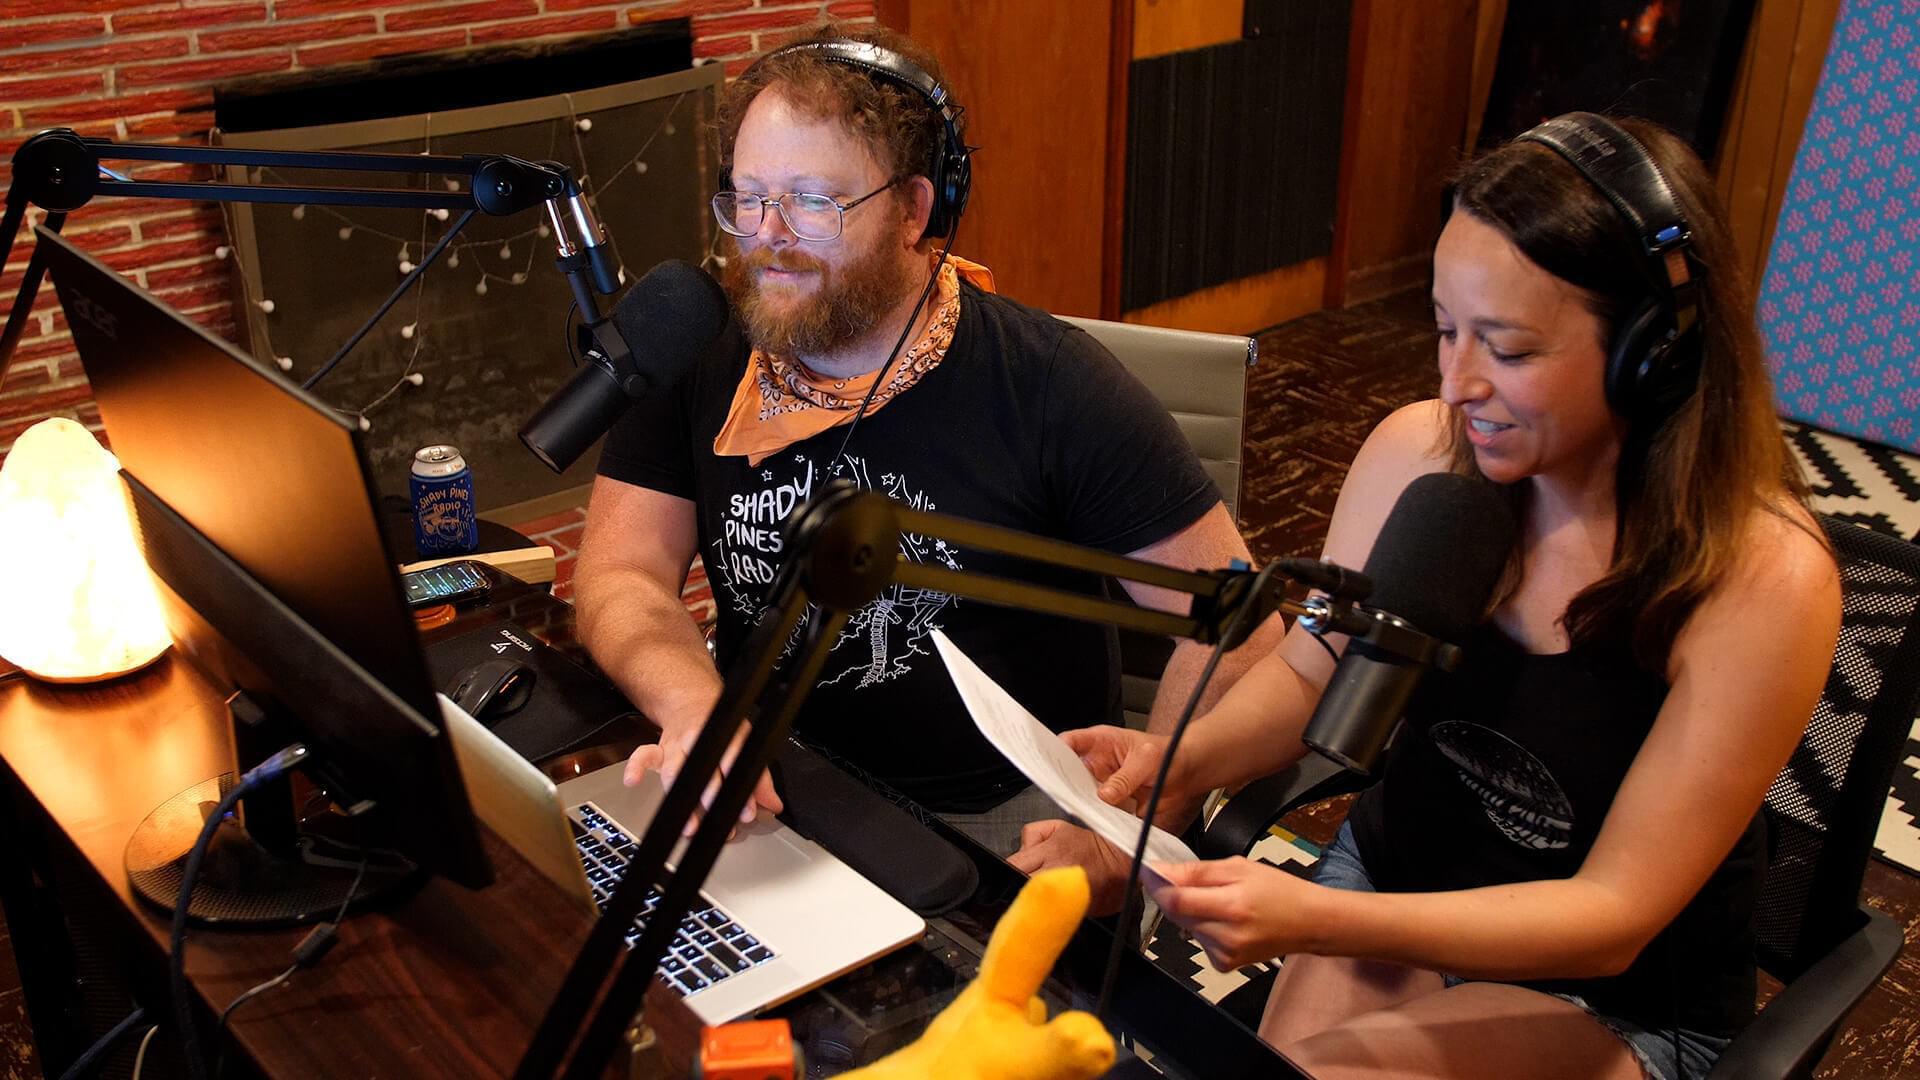 Shady pines radio case study header